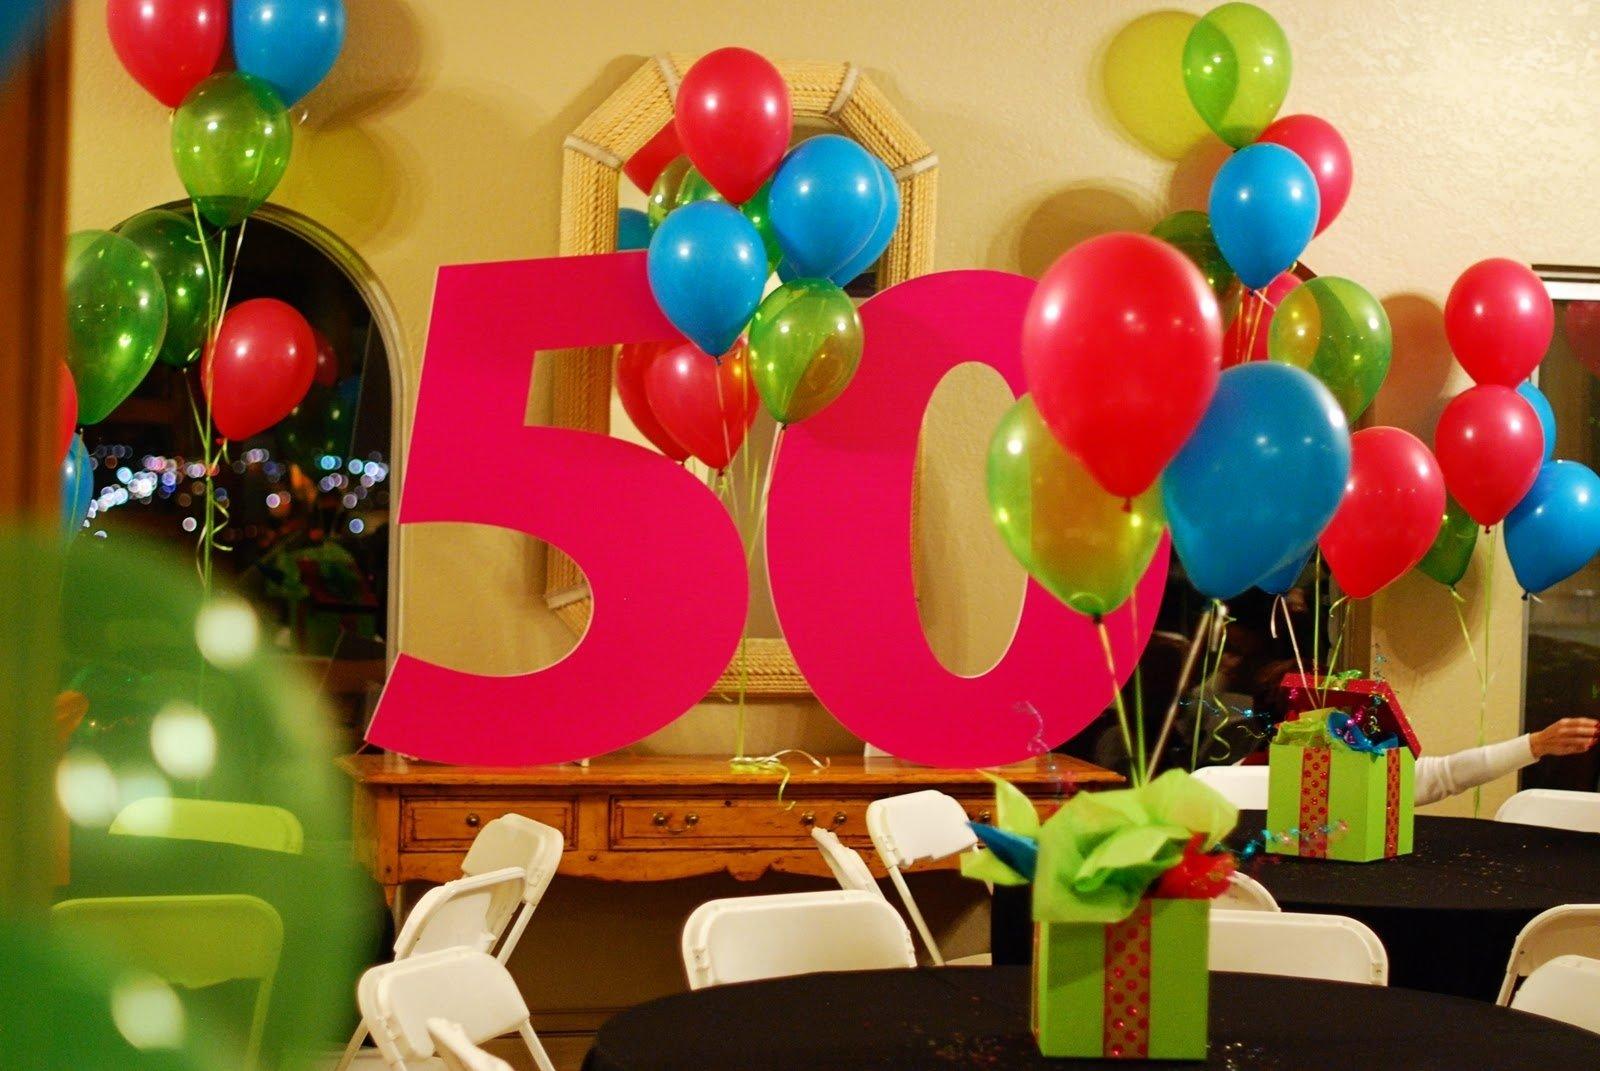 10 Wonderful Ideas To Celebrate 50Th Birthday a little lady utah part 1 my moms surprise 50th birthday 1 2021